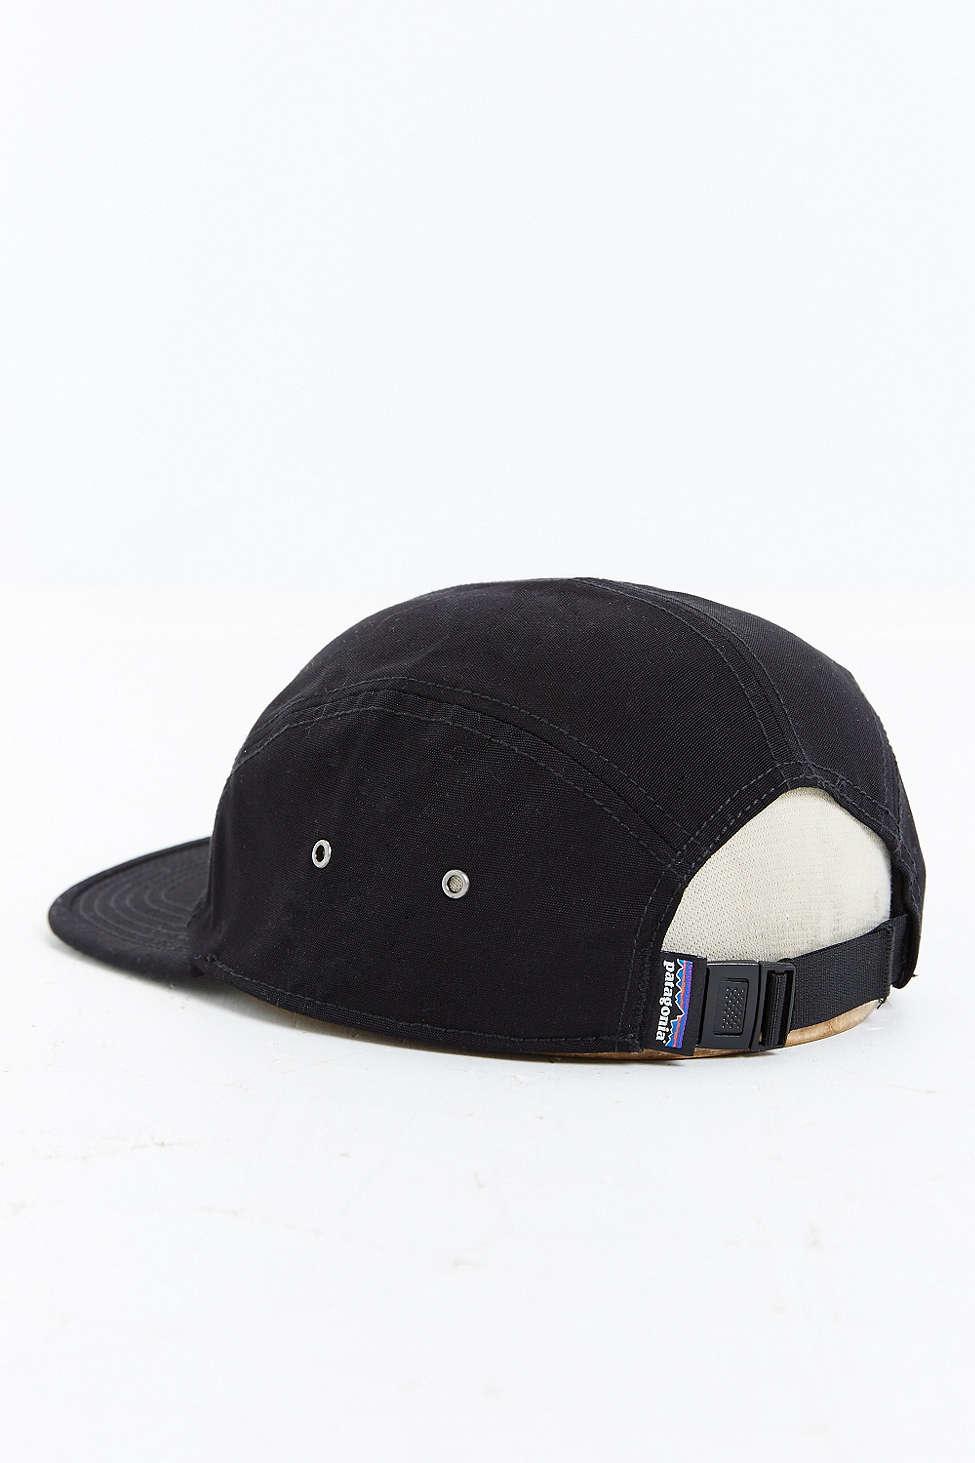 Lyst - Patagonia Retro Fitz Roy Label 5-panel Baseball Hat in Black ... 7244f05cb56